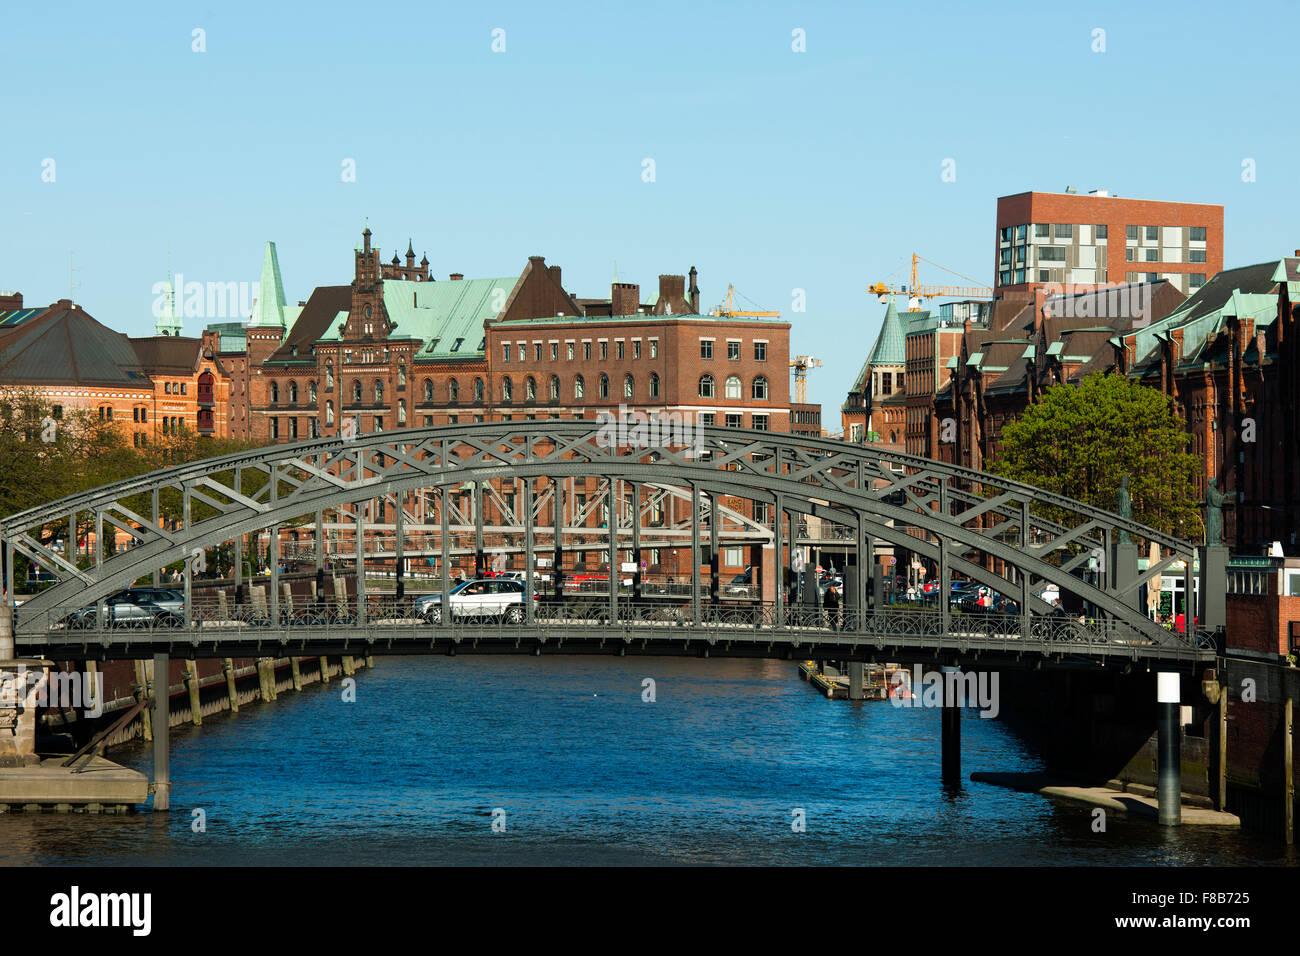 Deutschland, Hamburg, Speicherstadt, Zollkanal, Kibbelsteg Stock Photo